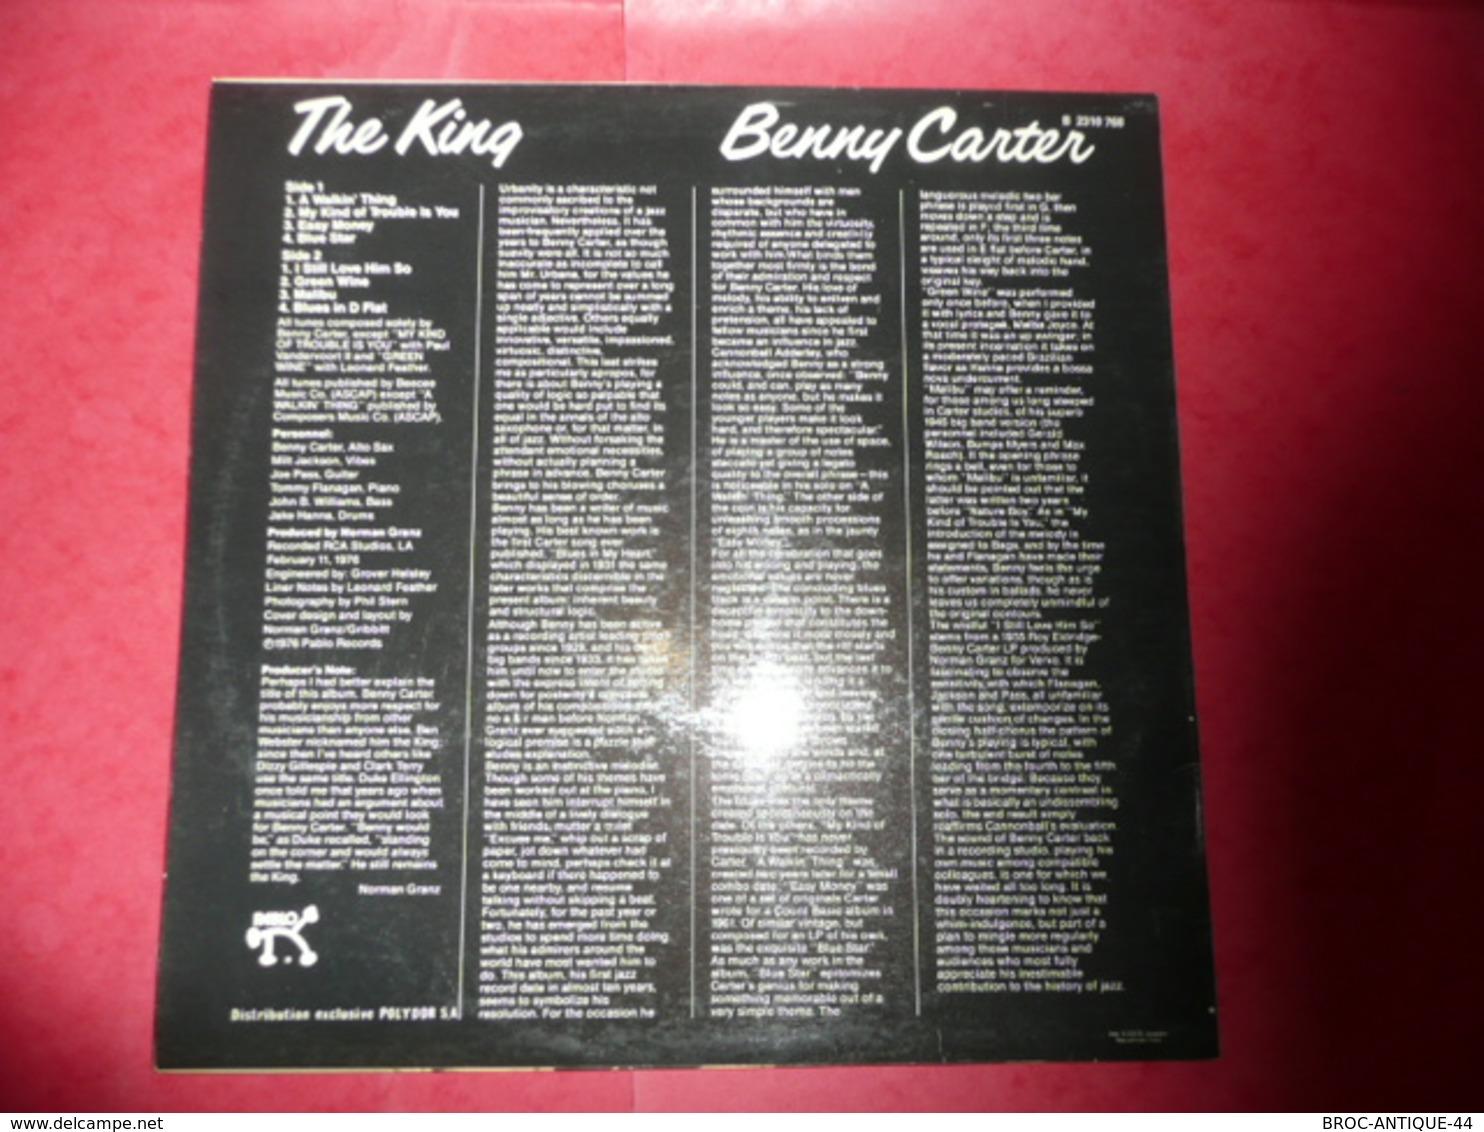 LP33 N°1148 - BENNY CARTER - THE KING - COMPILATION 8 TITRES - Jazz